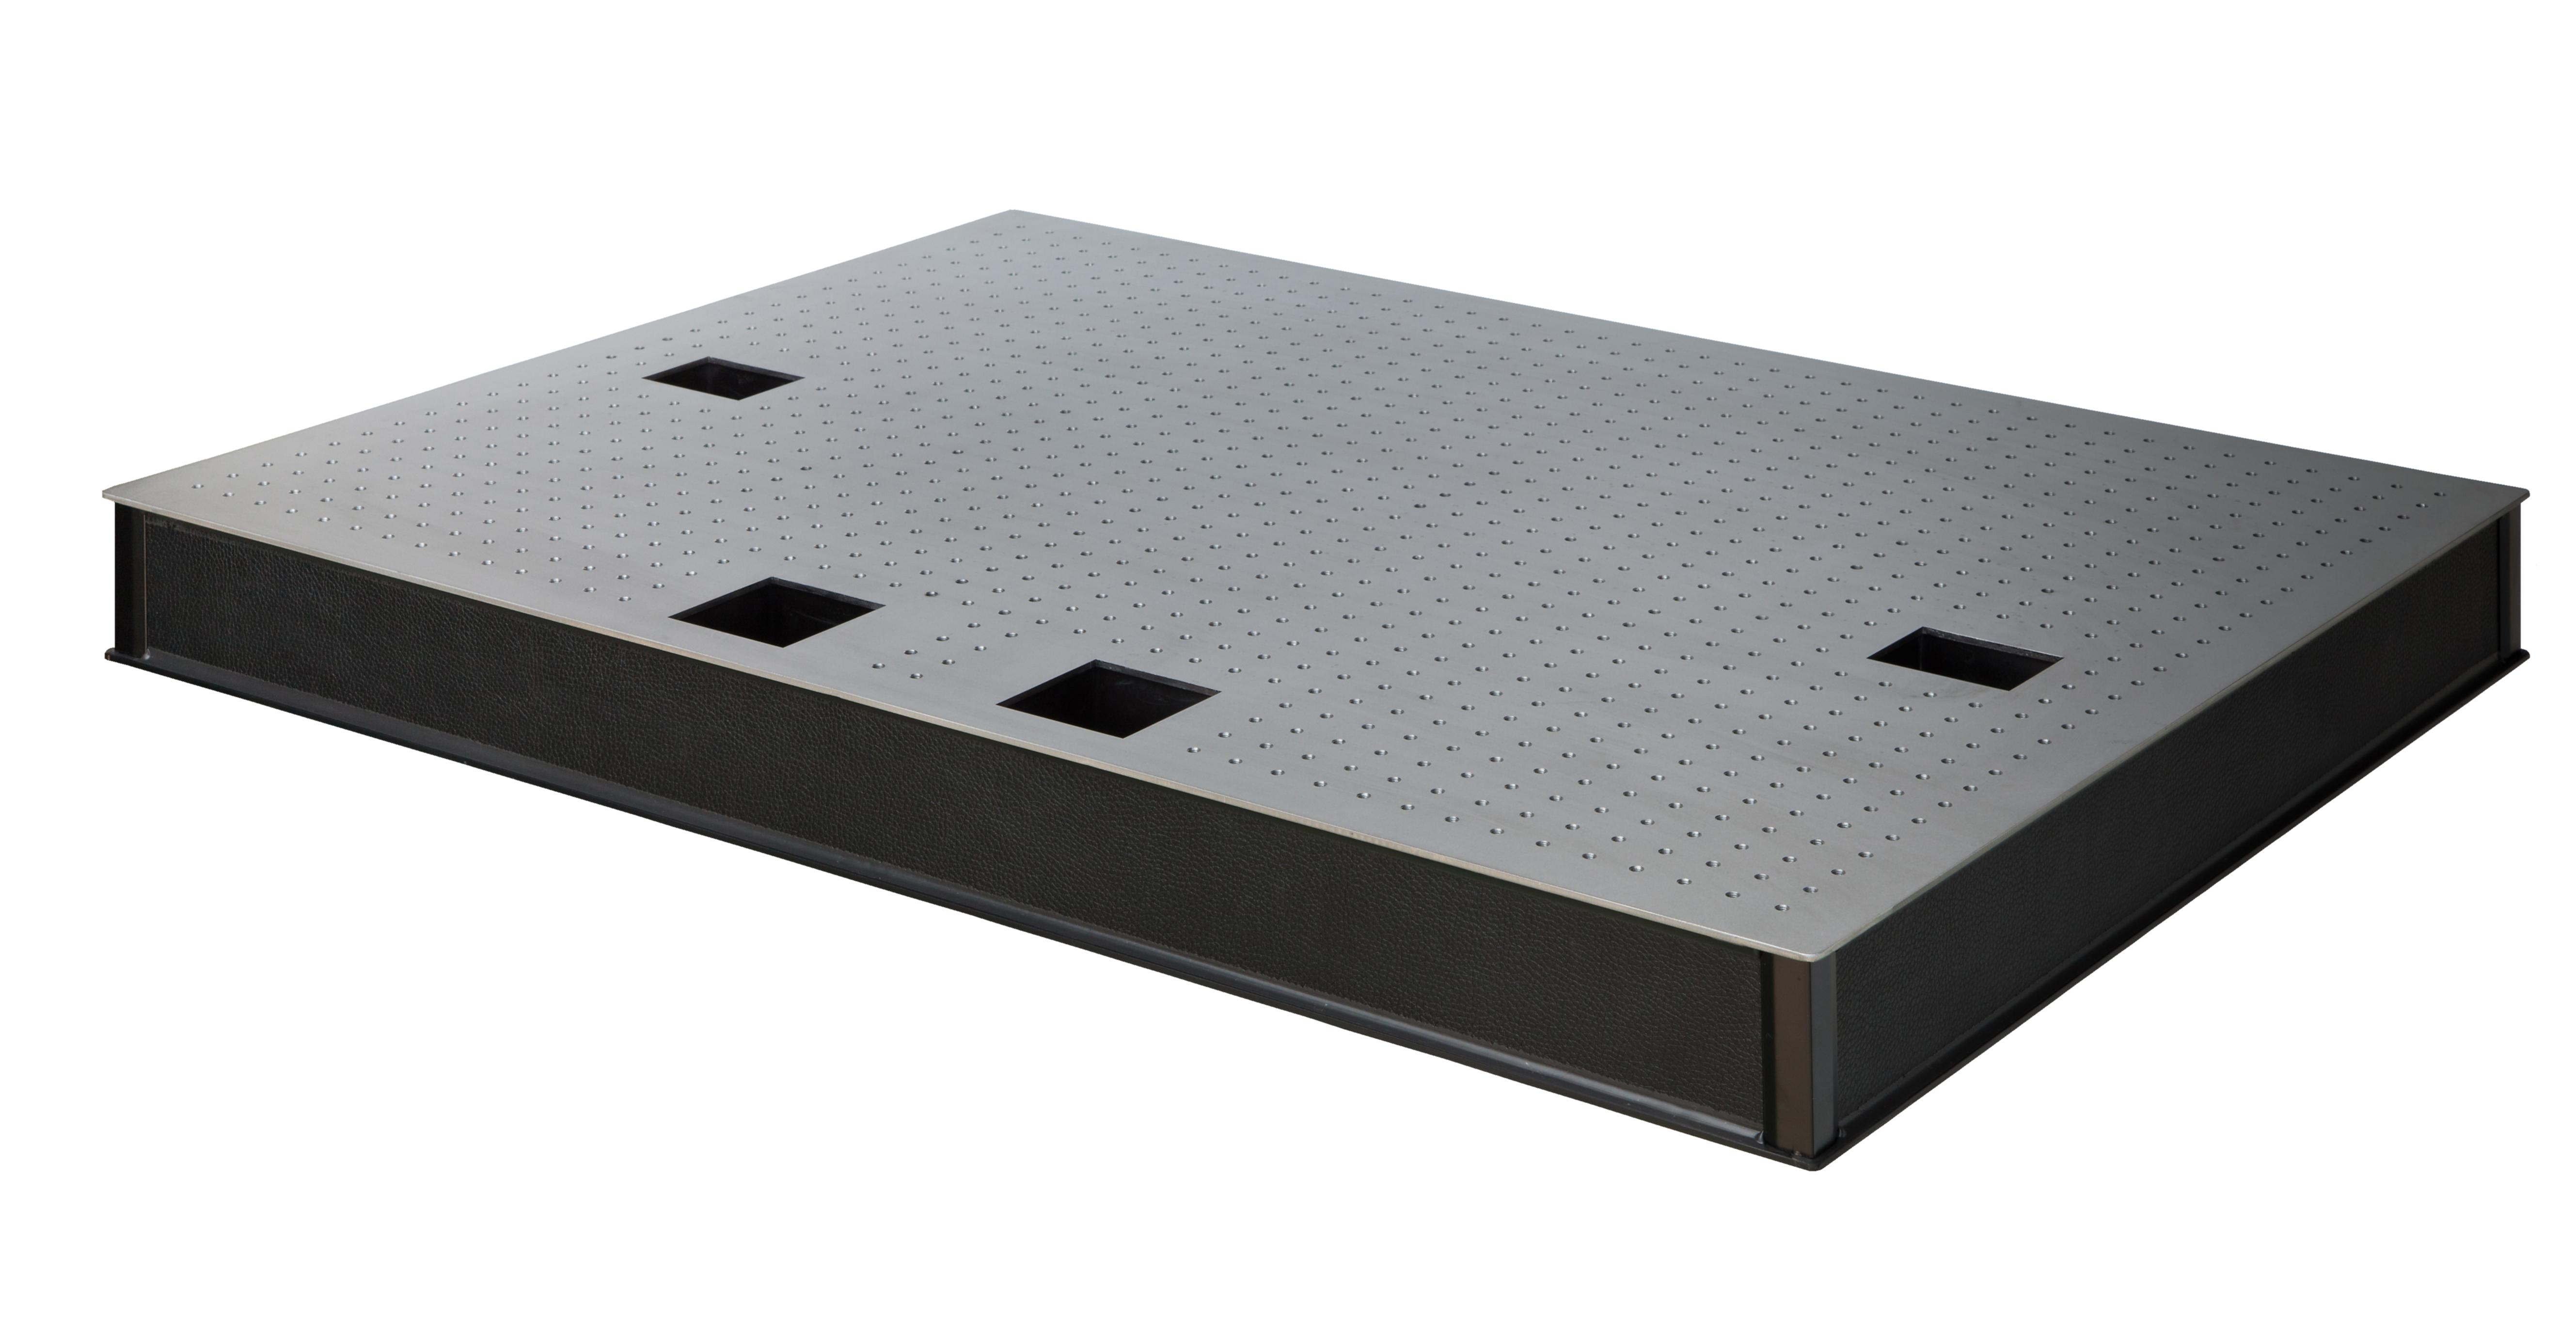 Custom-made Optical TableTop